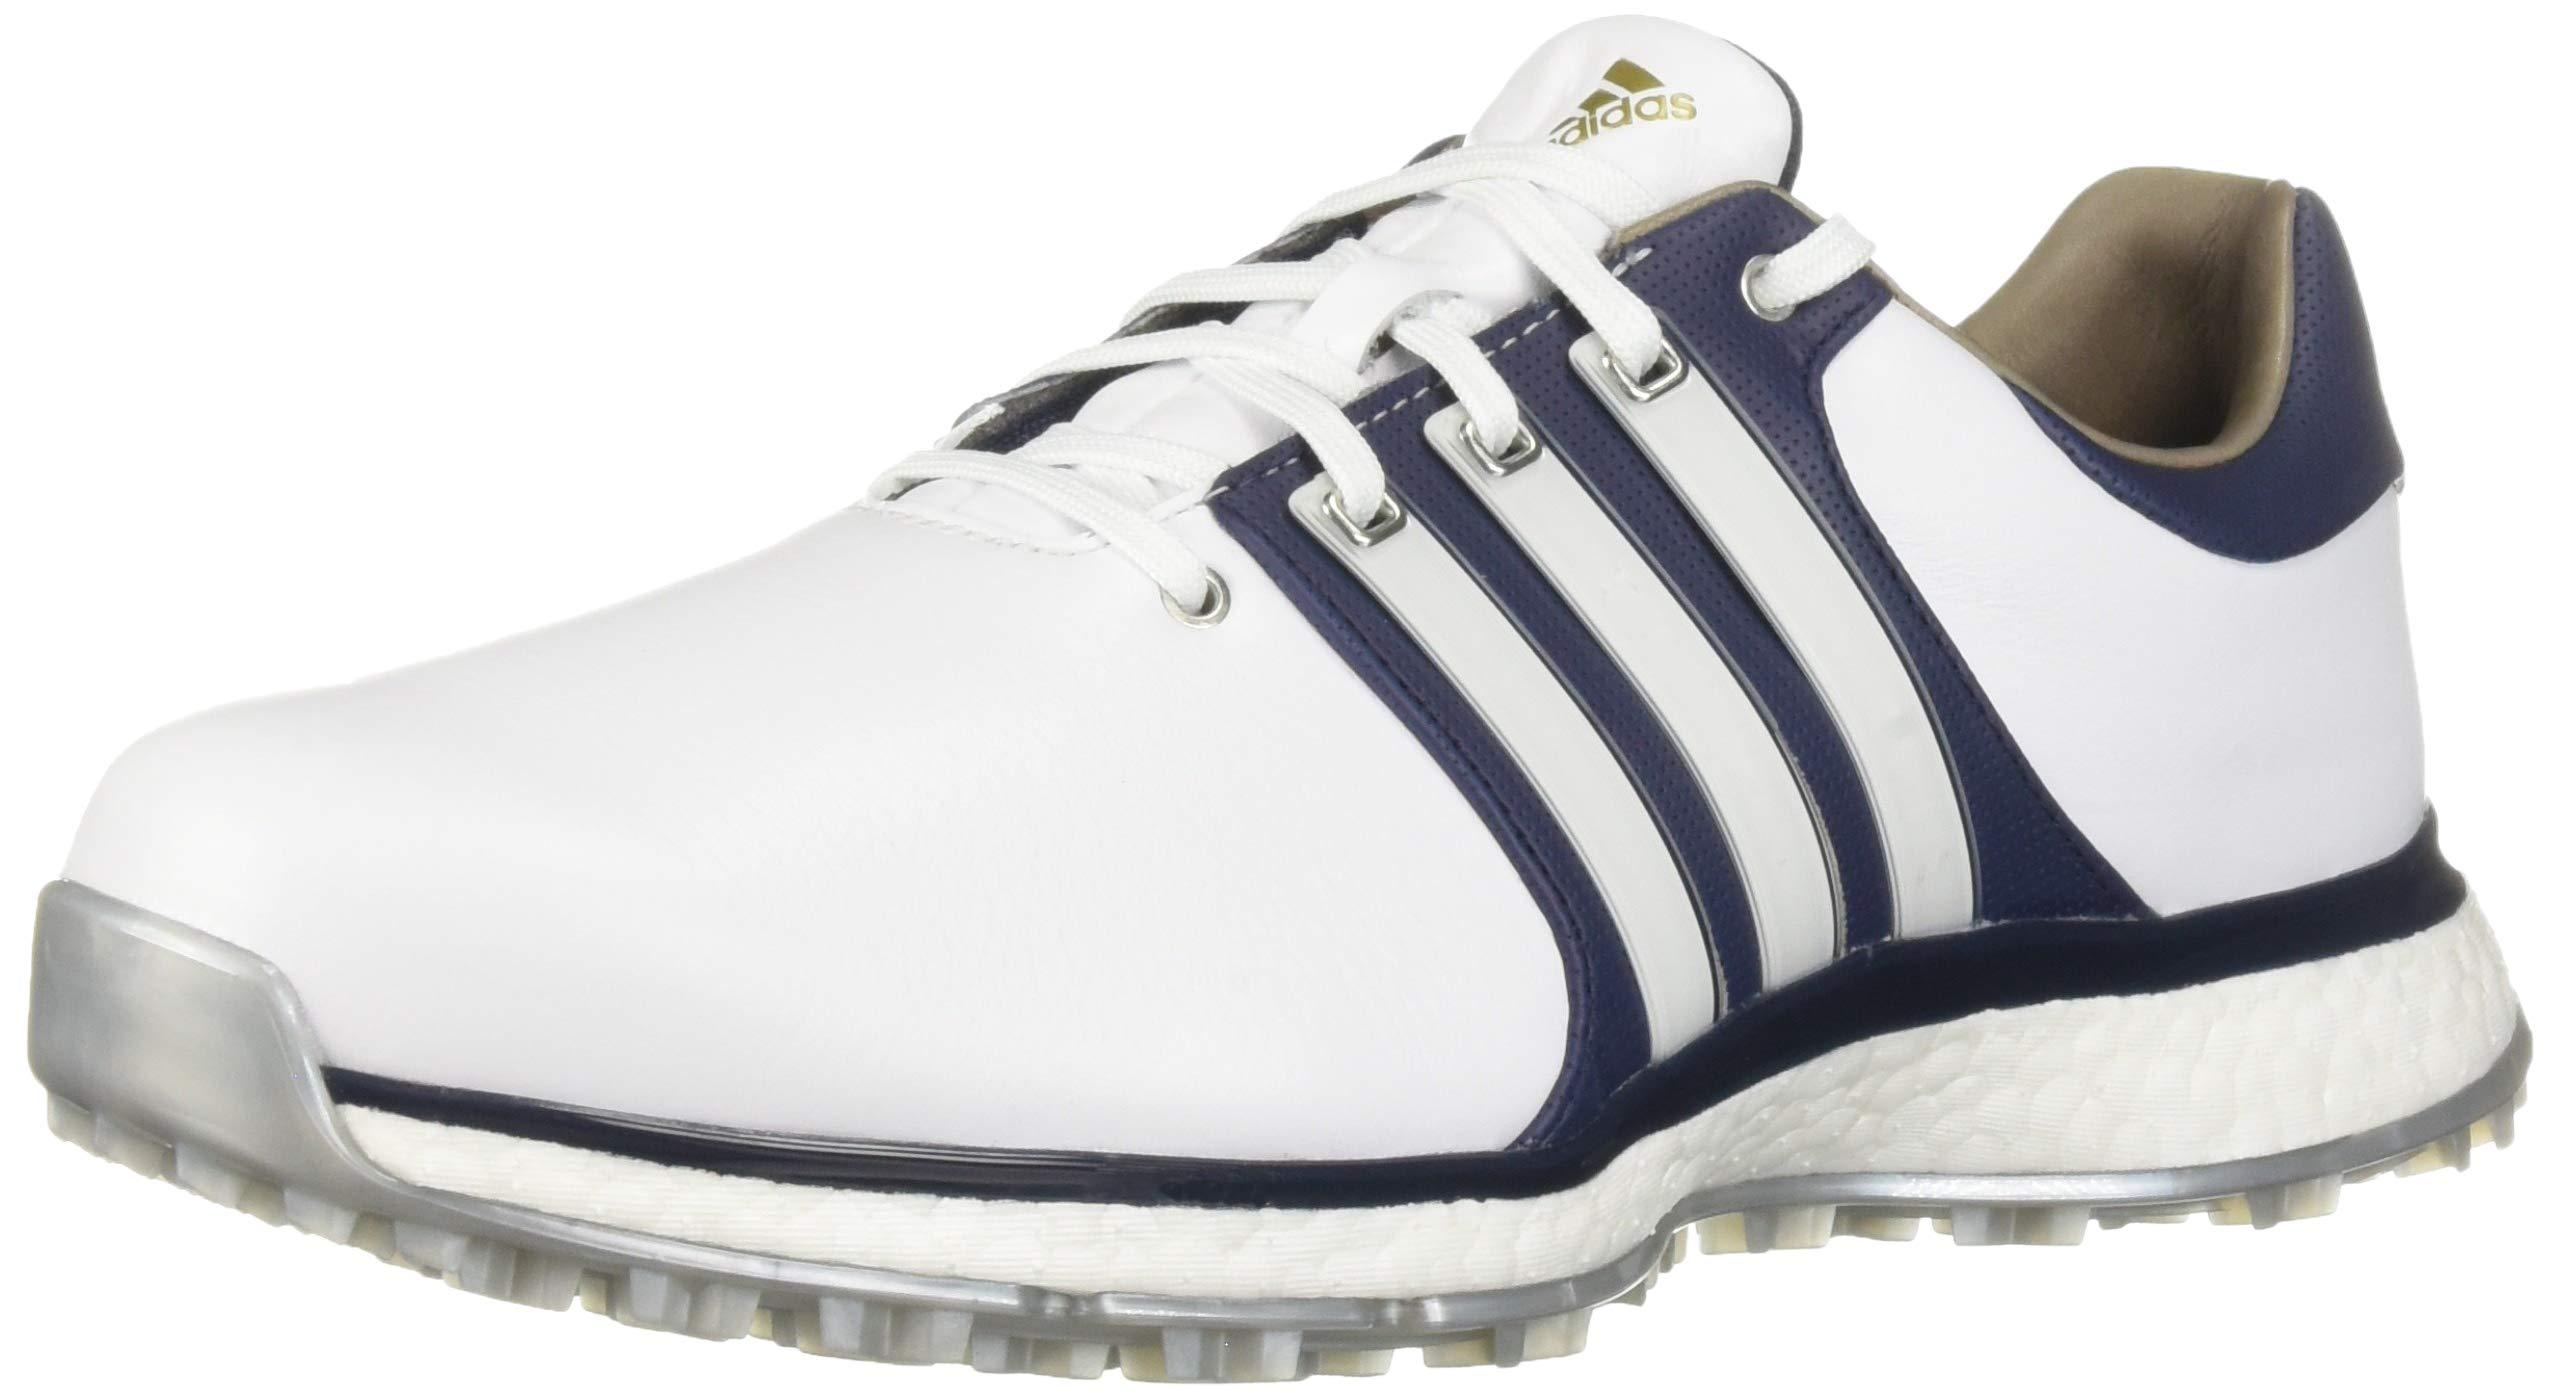 adidas Men's TOUR360 XT Spikeless Golf Shoe, FTWR White/Collegiate Navy/Silver Metallic, 13 W US by adidas